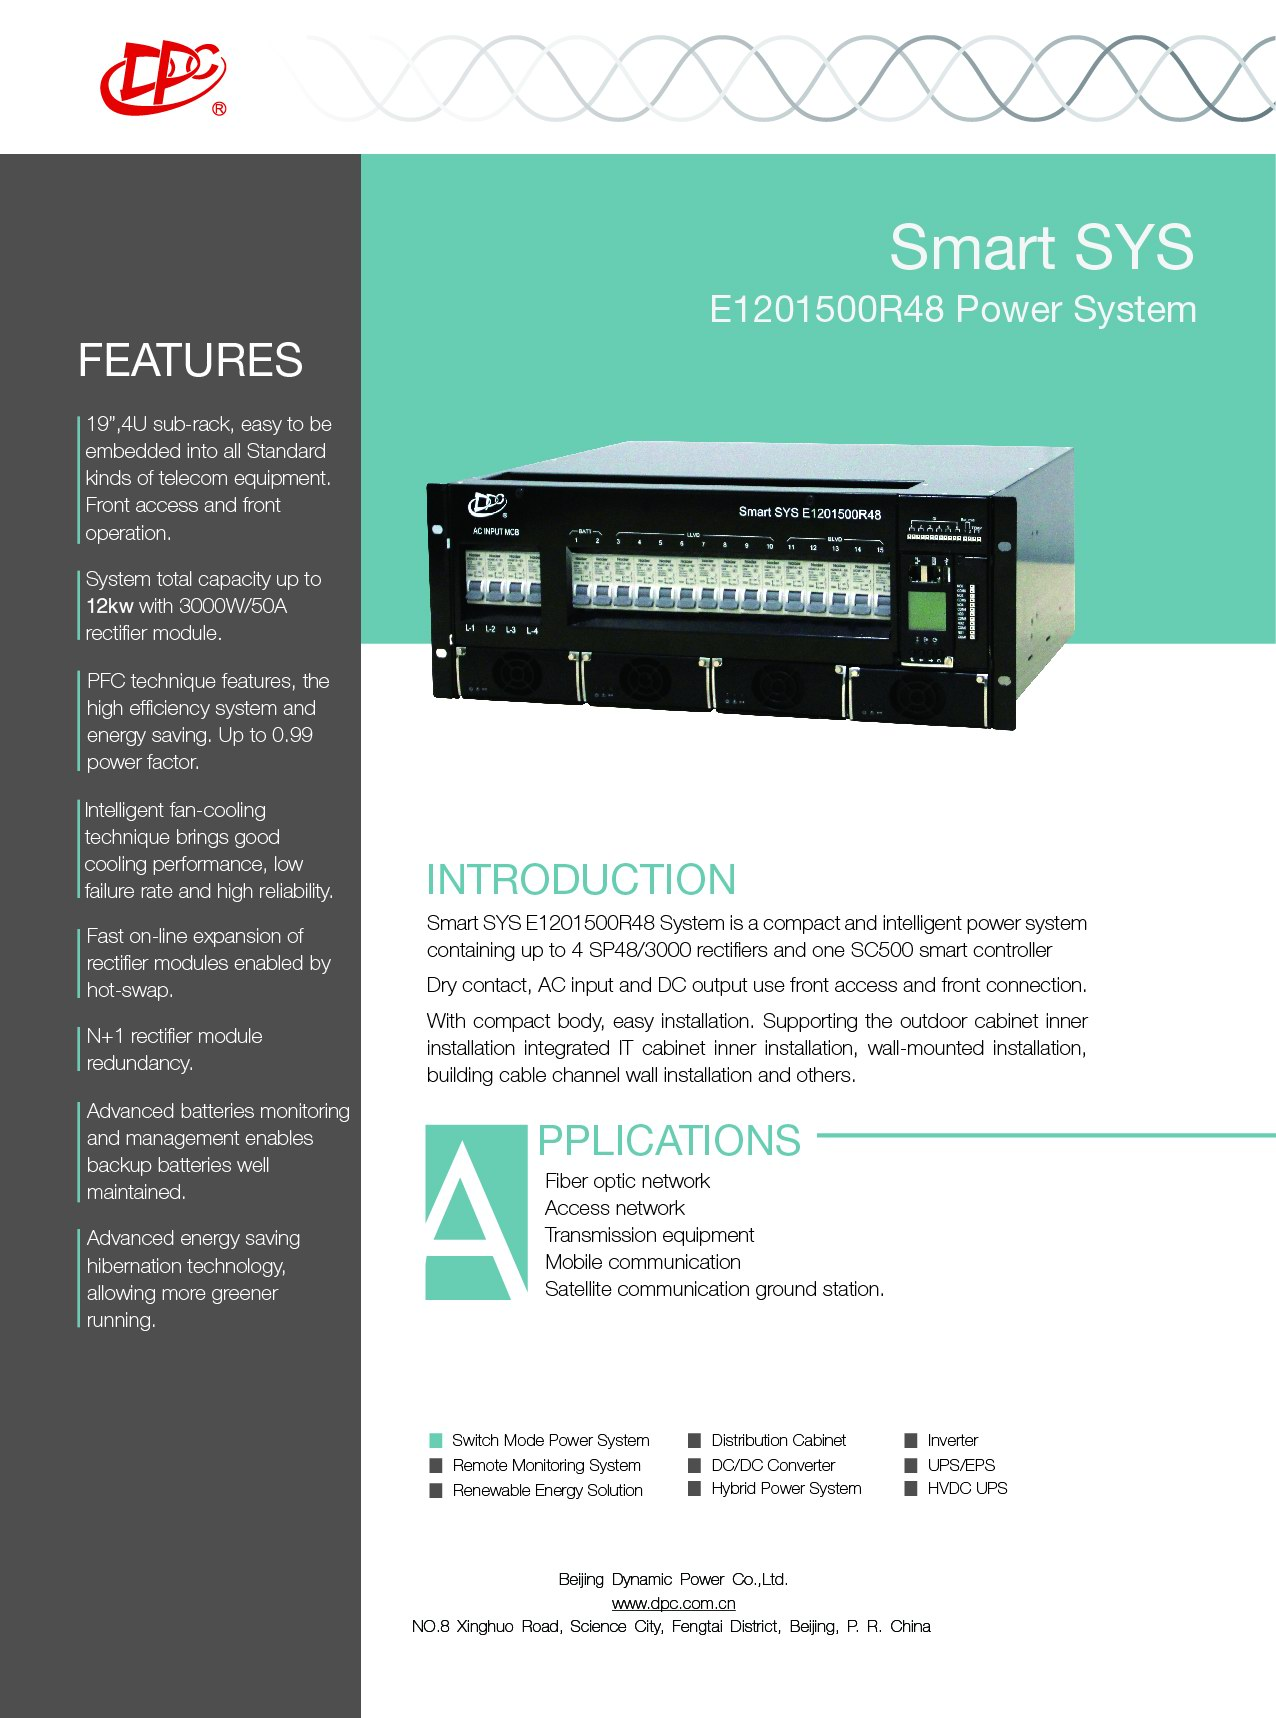 Smart Sys E1201500r48